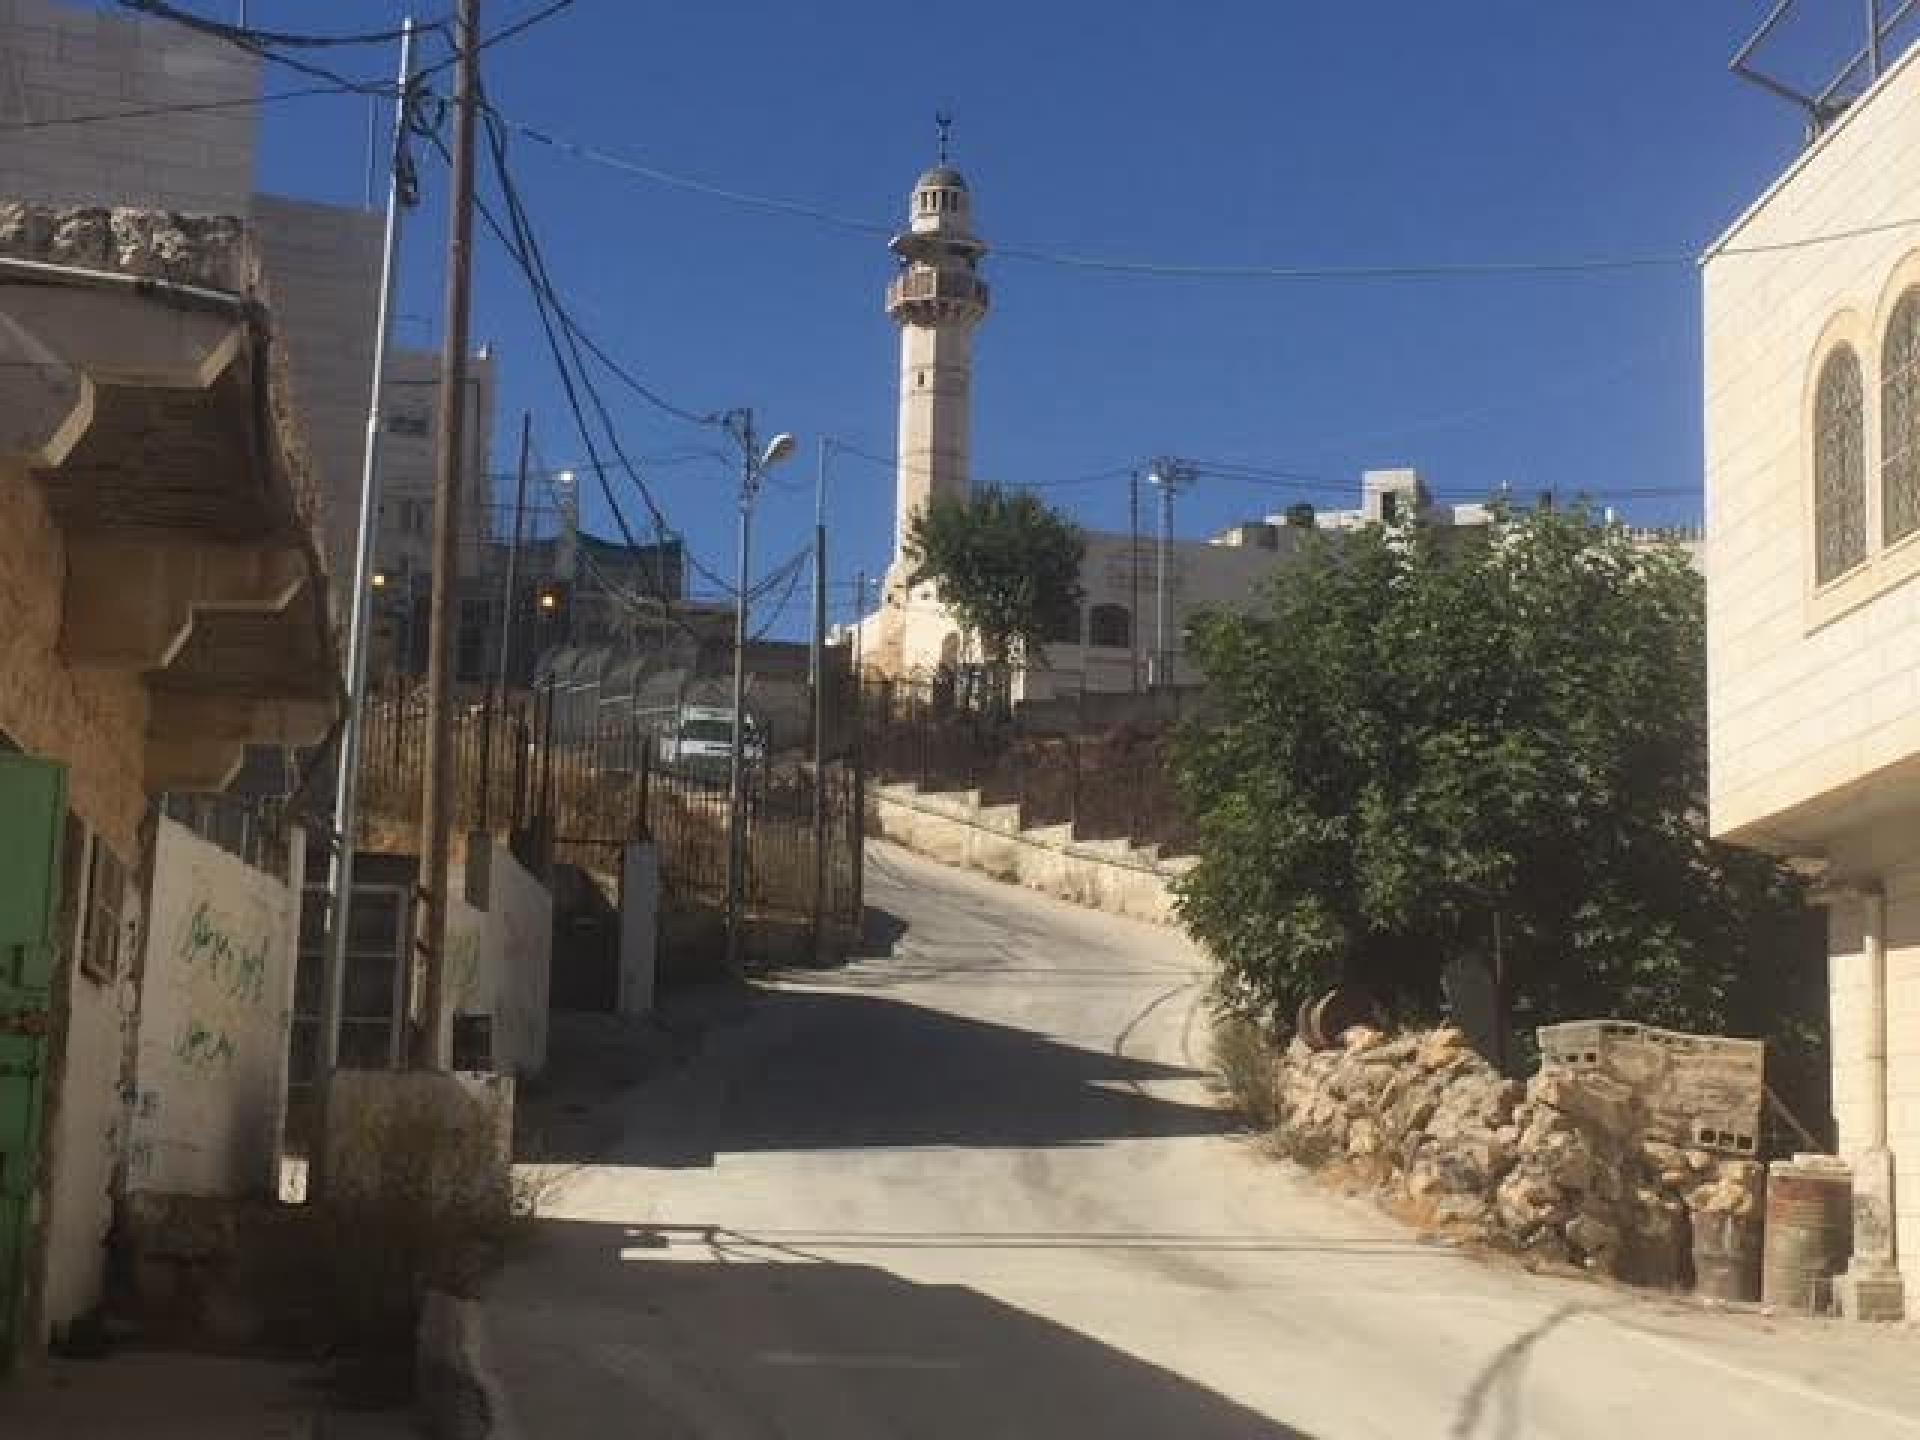 Tel Rumaida checkpoint viewed from below